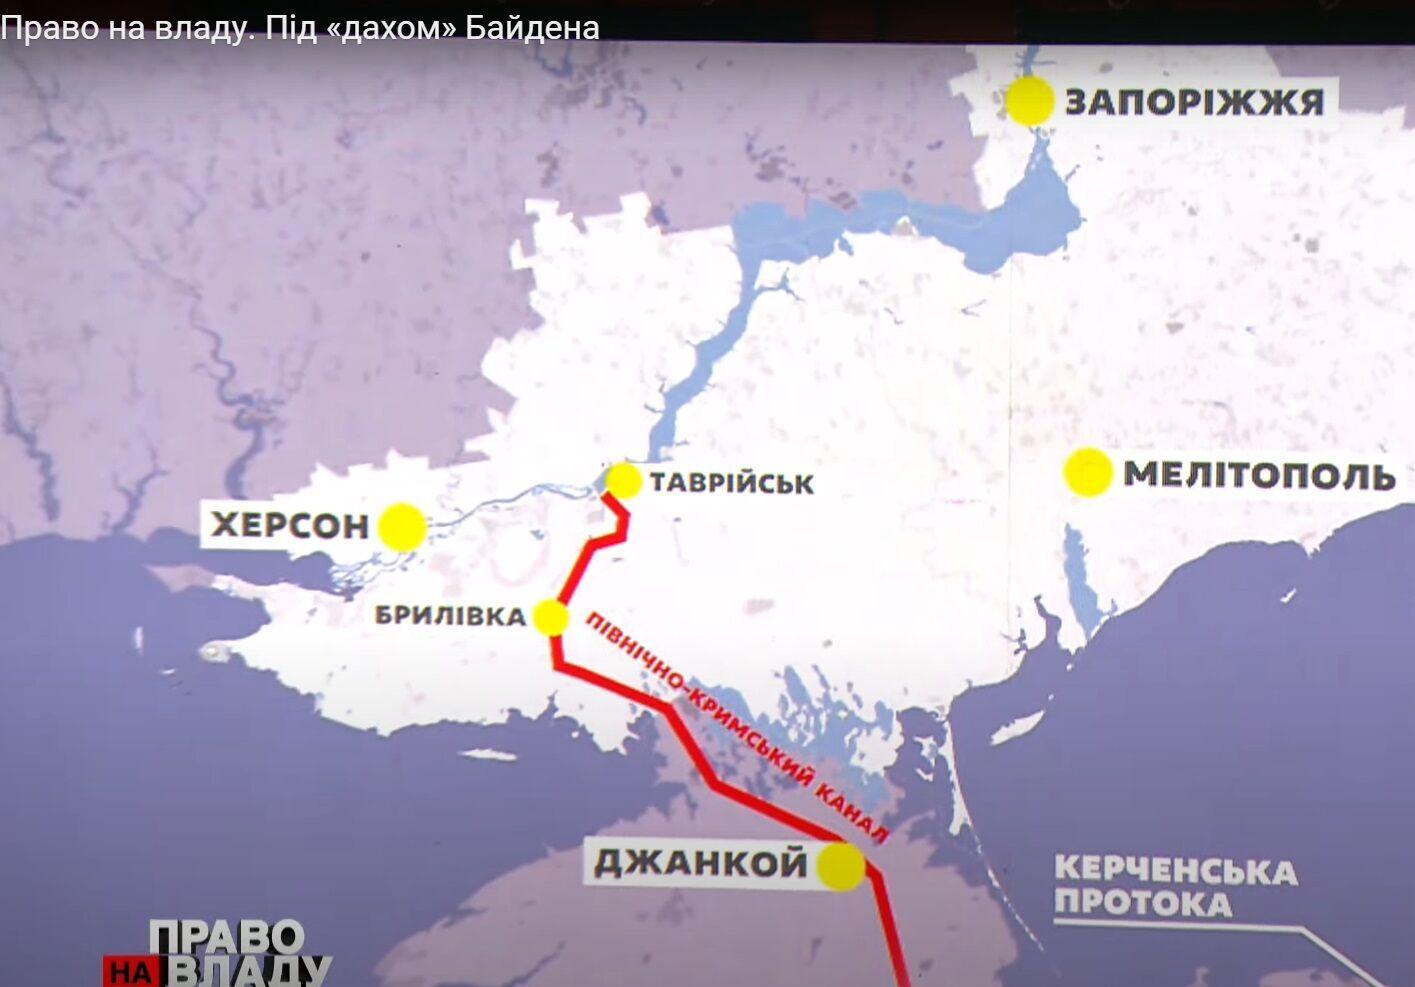 Де Росія може напасти на Україну.